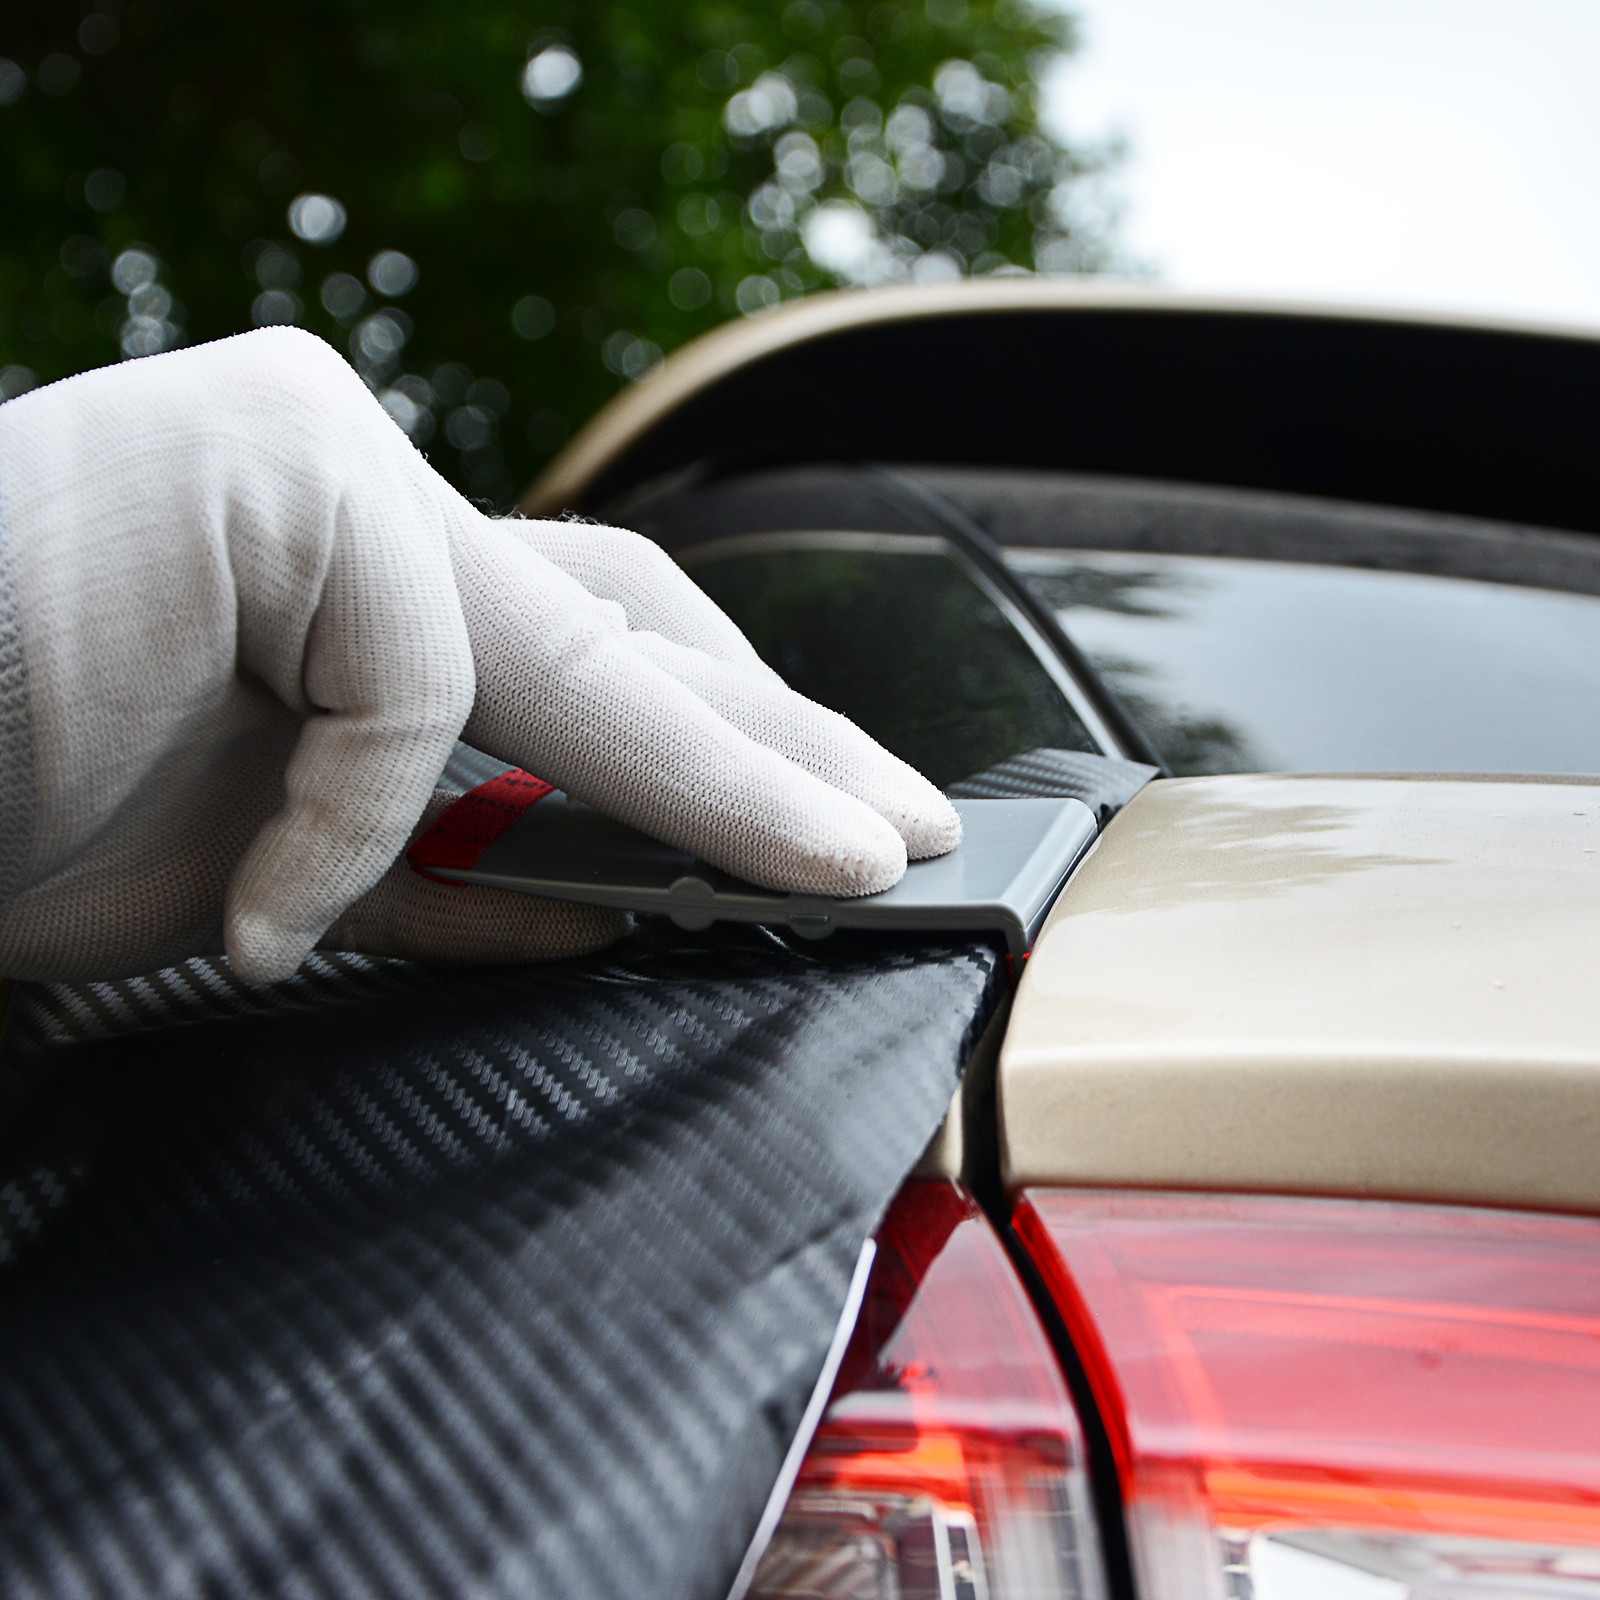 Image 4 - FOSHIO 90 Degree Vinyl Car Wrap Microfiber Squeegee Edge Scraper Carbon Fiber Film Stickers Wrapping Tool Auto Window Tint Tools